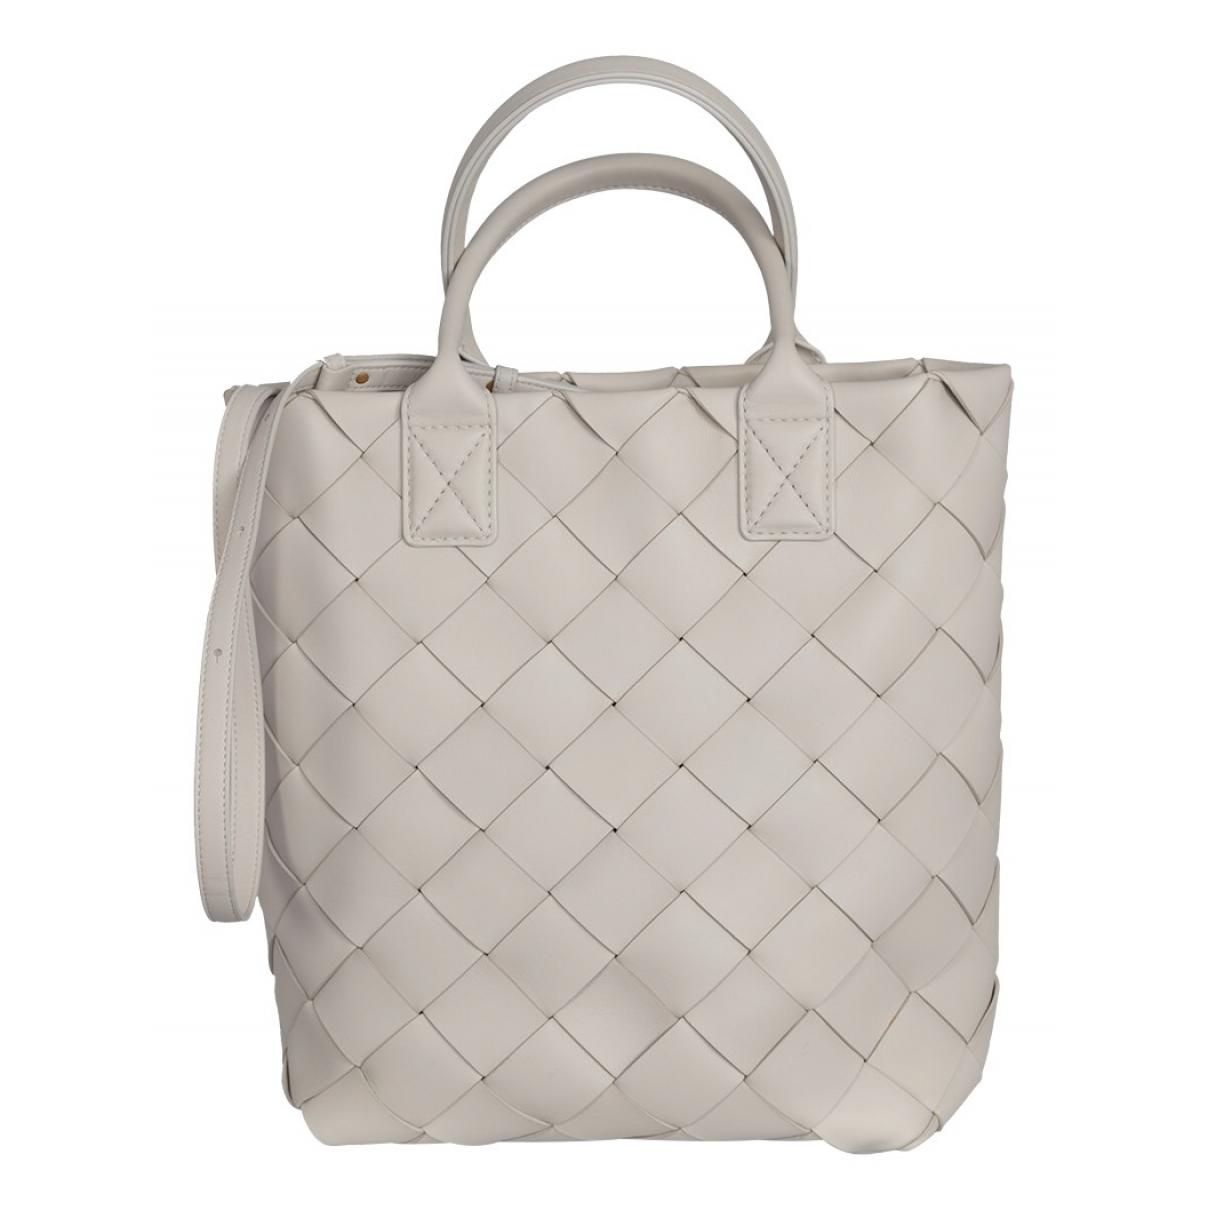 Bottega Veneta Maxi Cabat 30  White Leather handbag for Women N